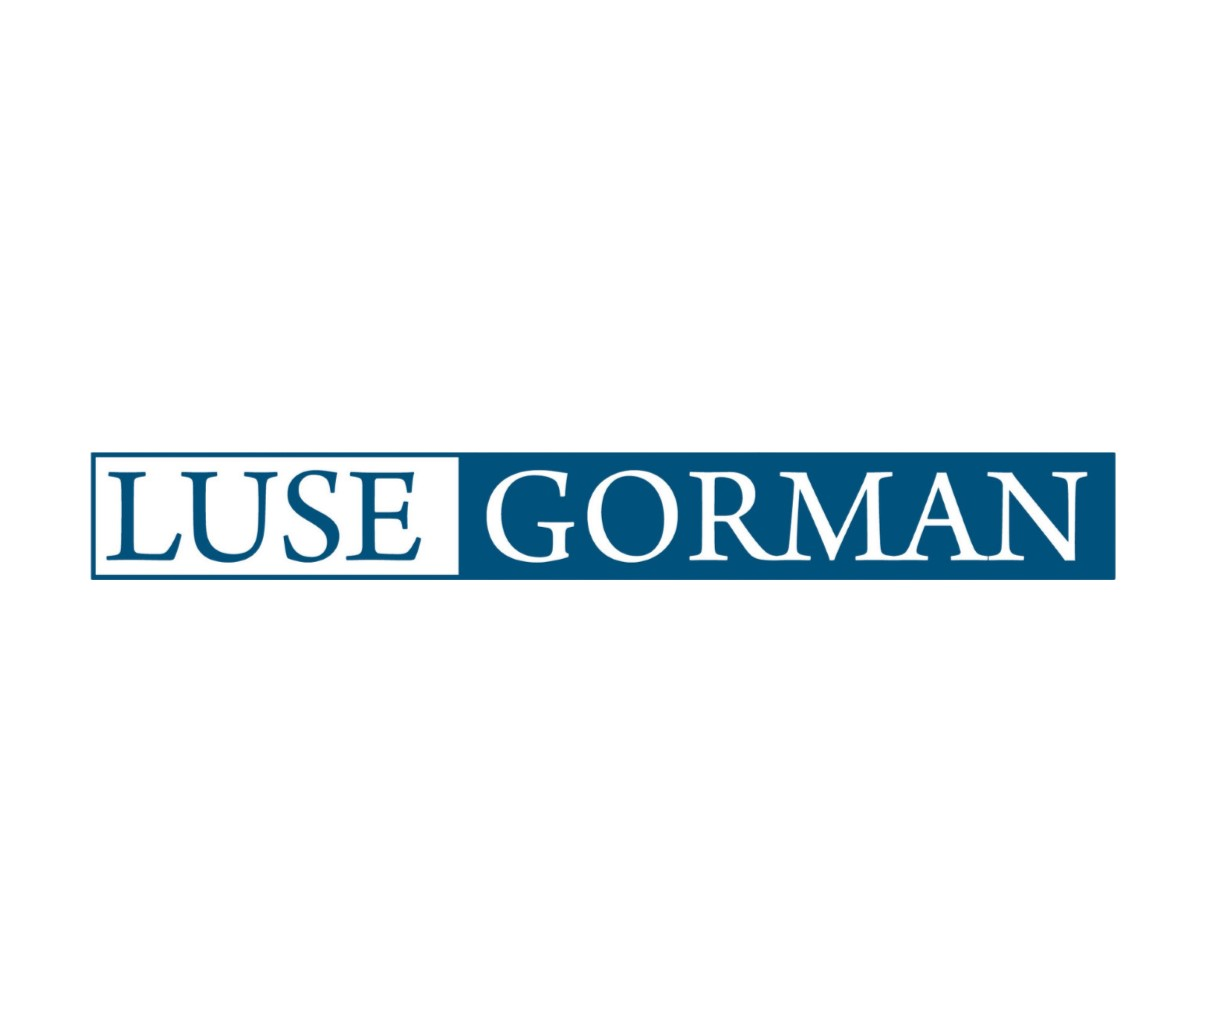 LuseGorman-Logo-ConventionSponsor-Reel-4